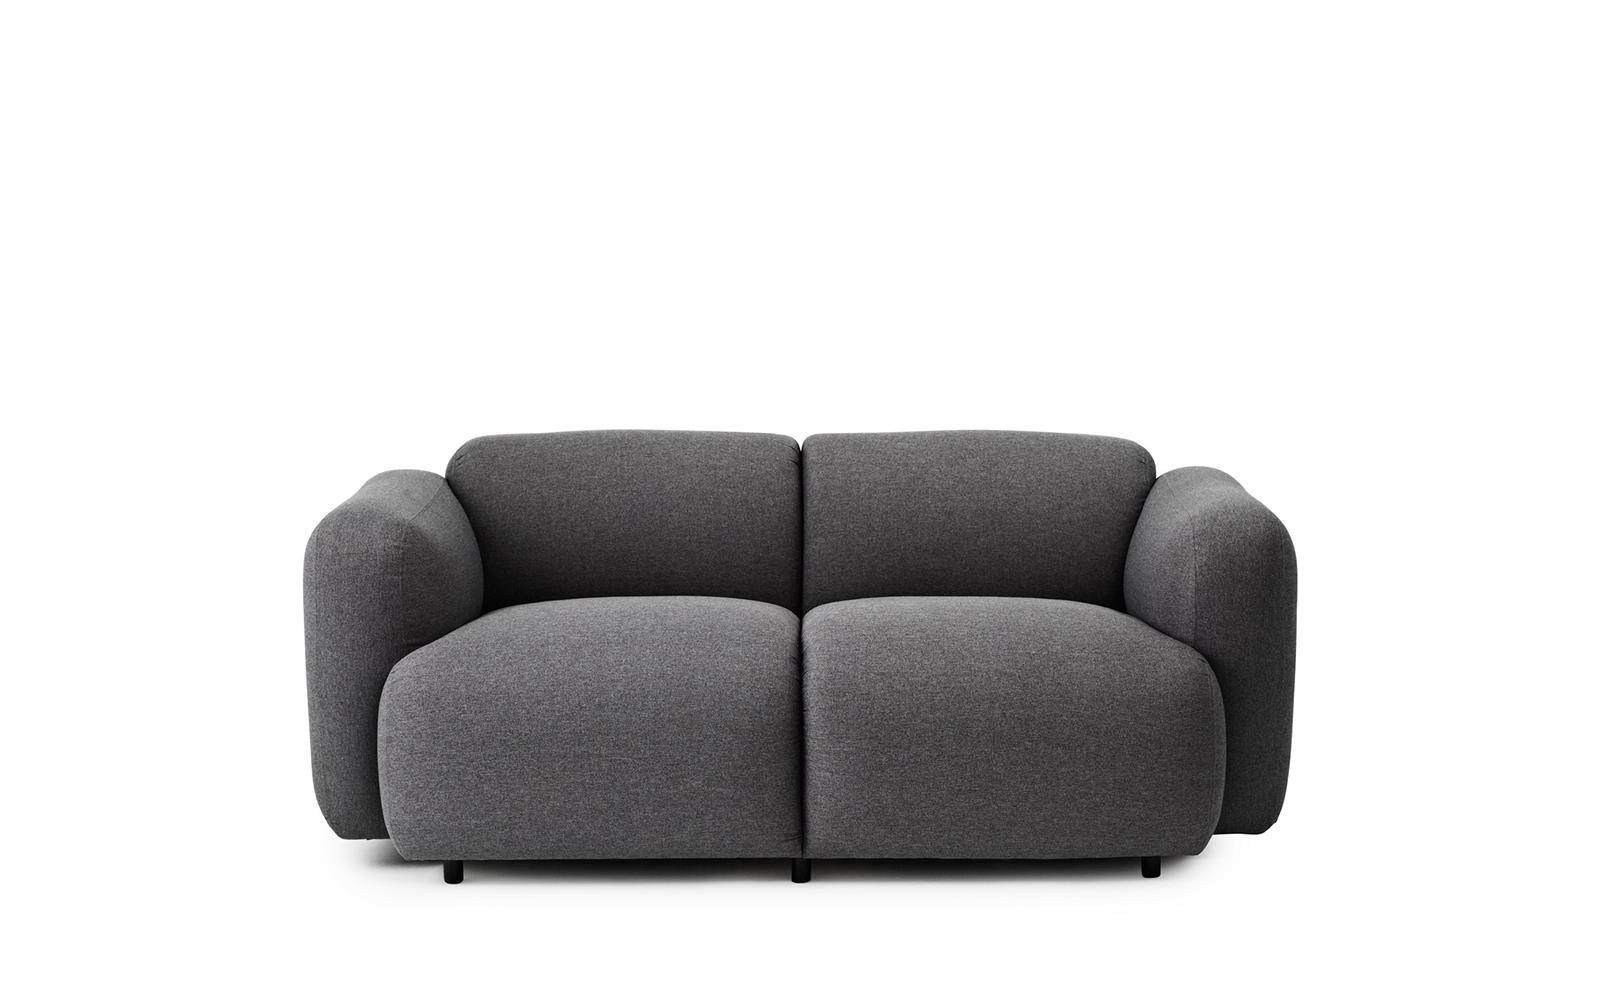 Swell Sofa 2 Seater1